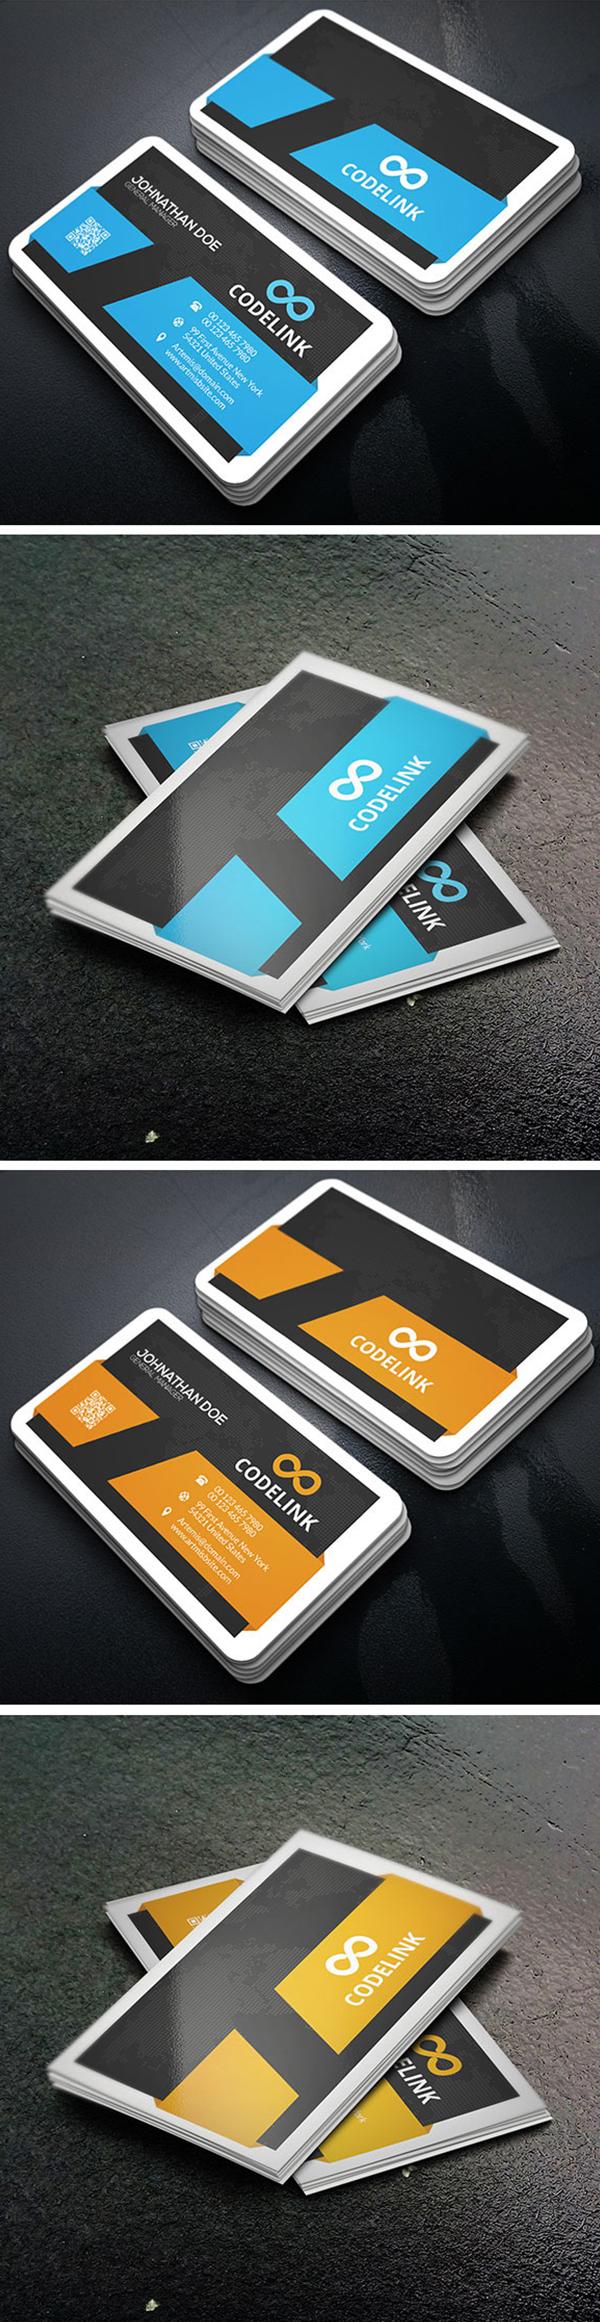 09 Business Card Design